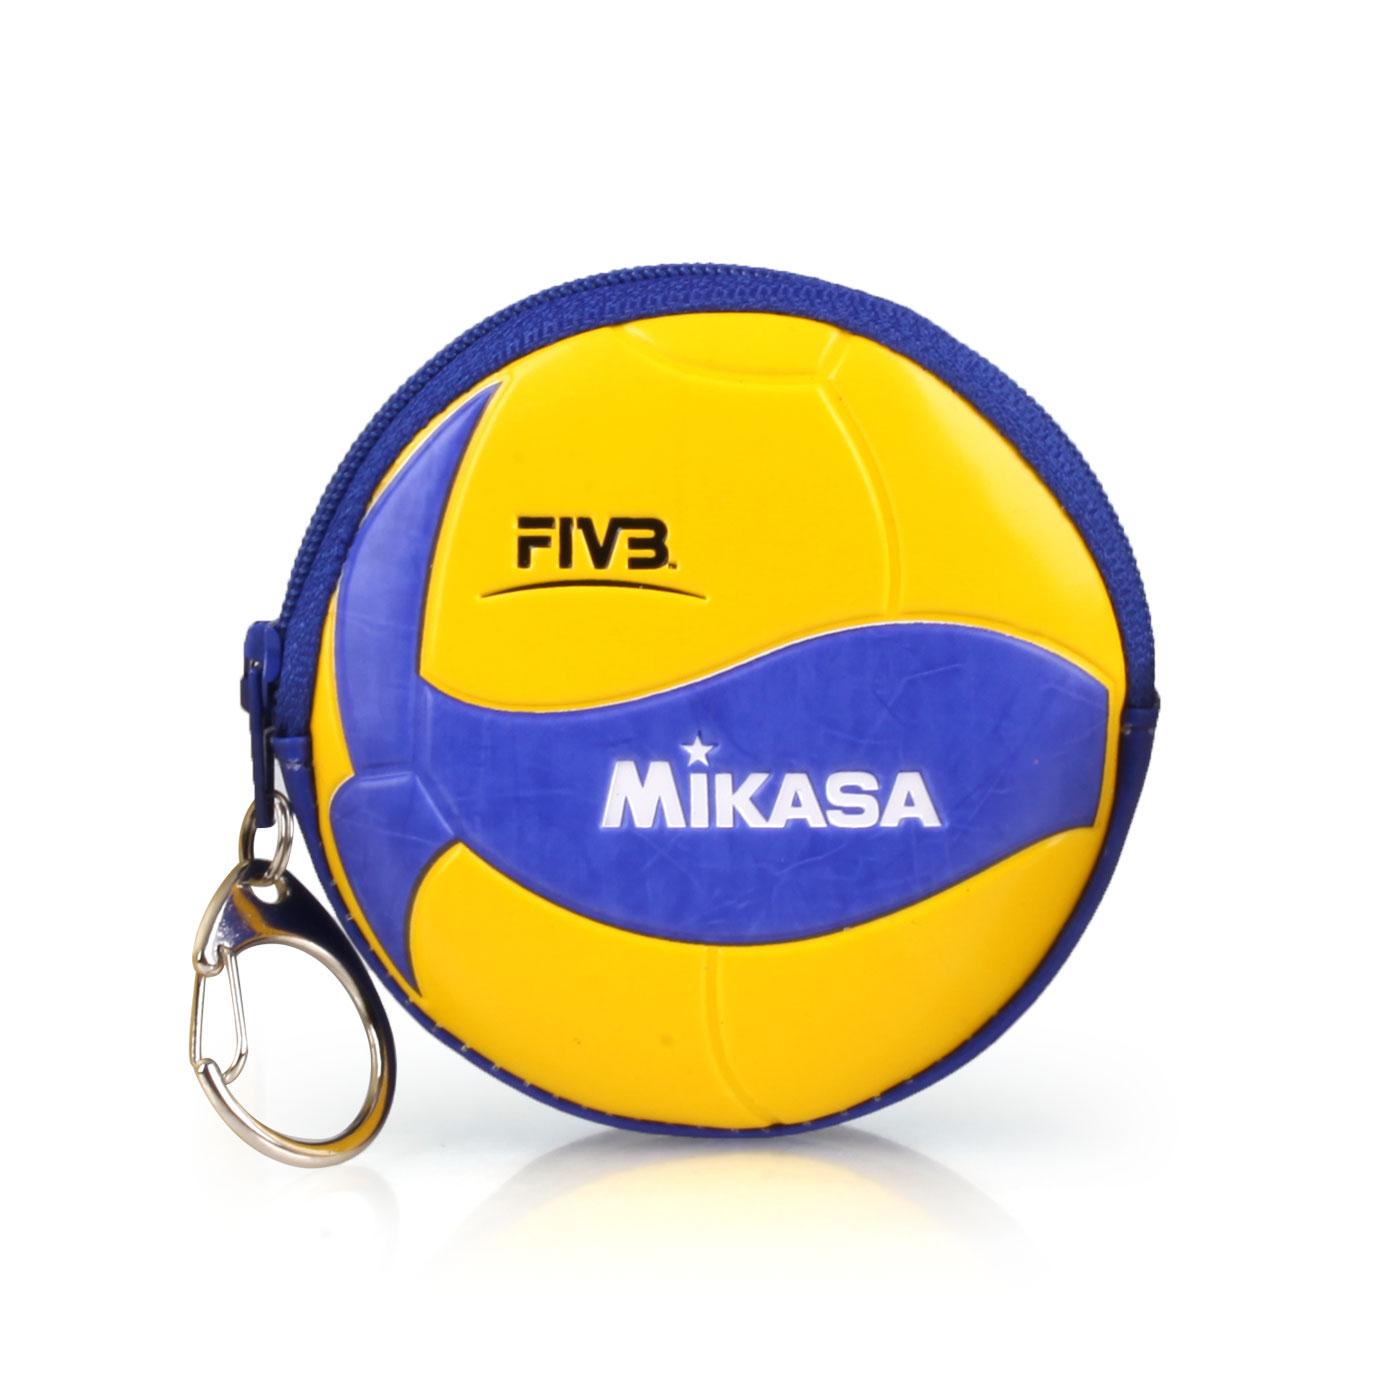 MIKASA 零錢包 MKAC-CP200W - 黃藍